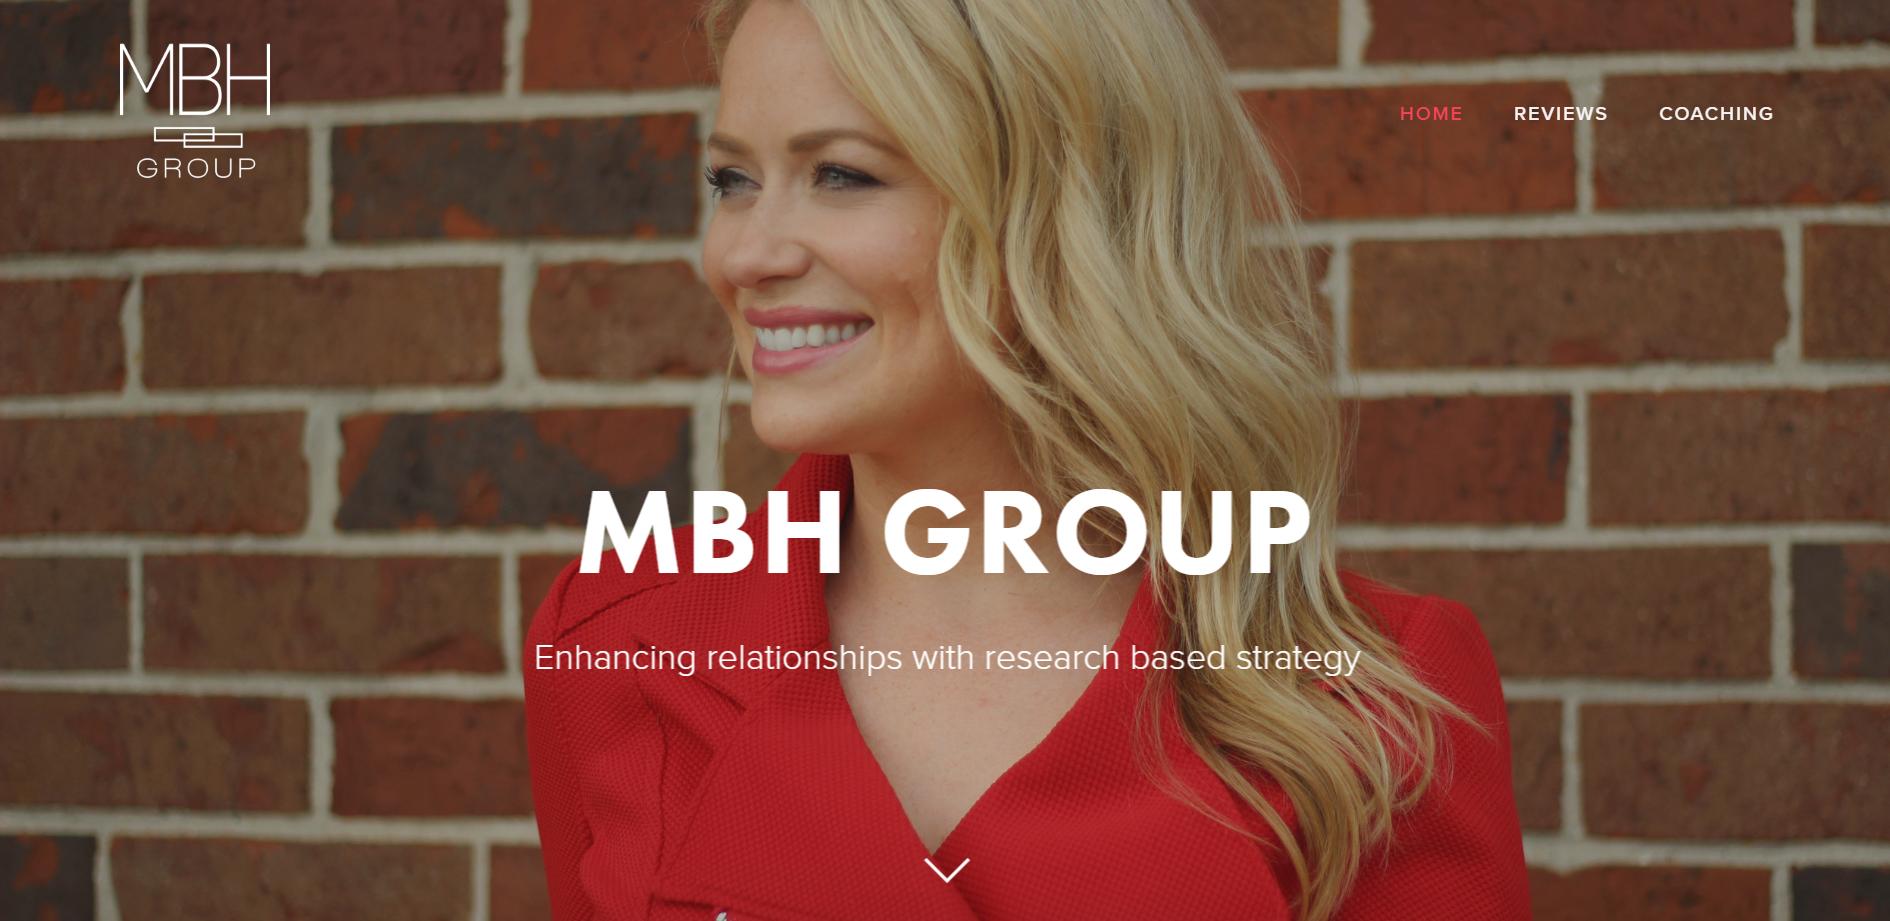 mbh web1.jpg